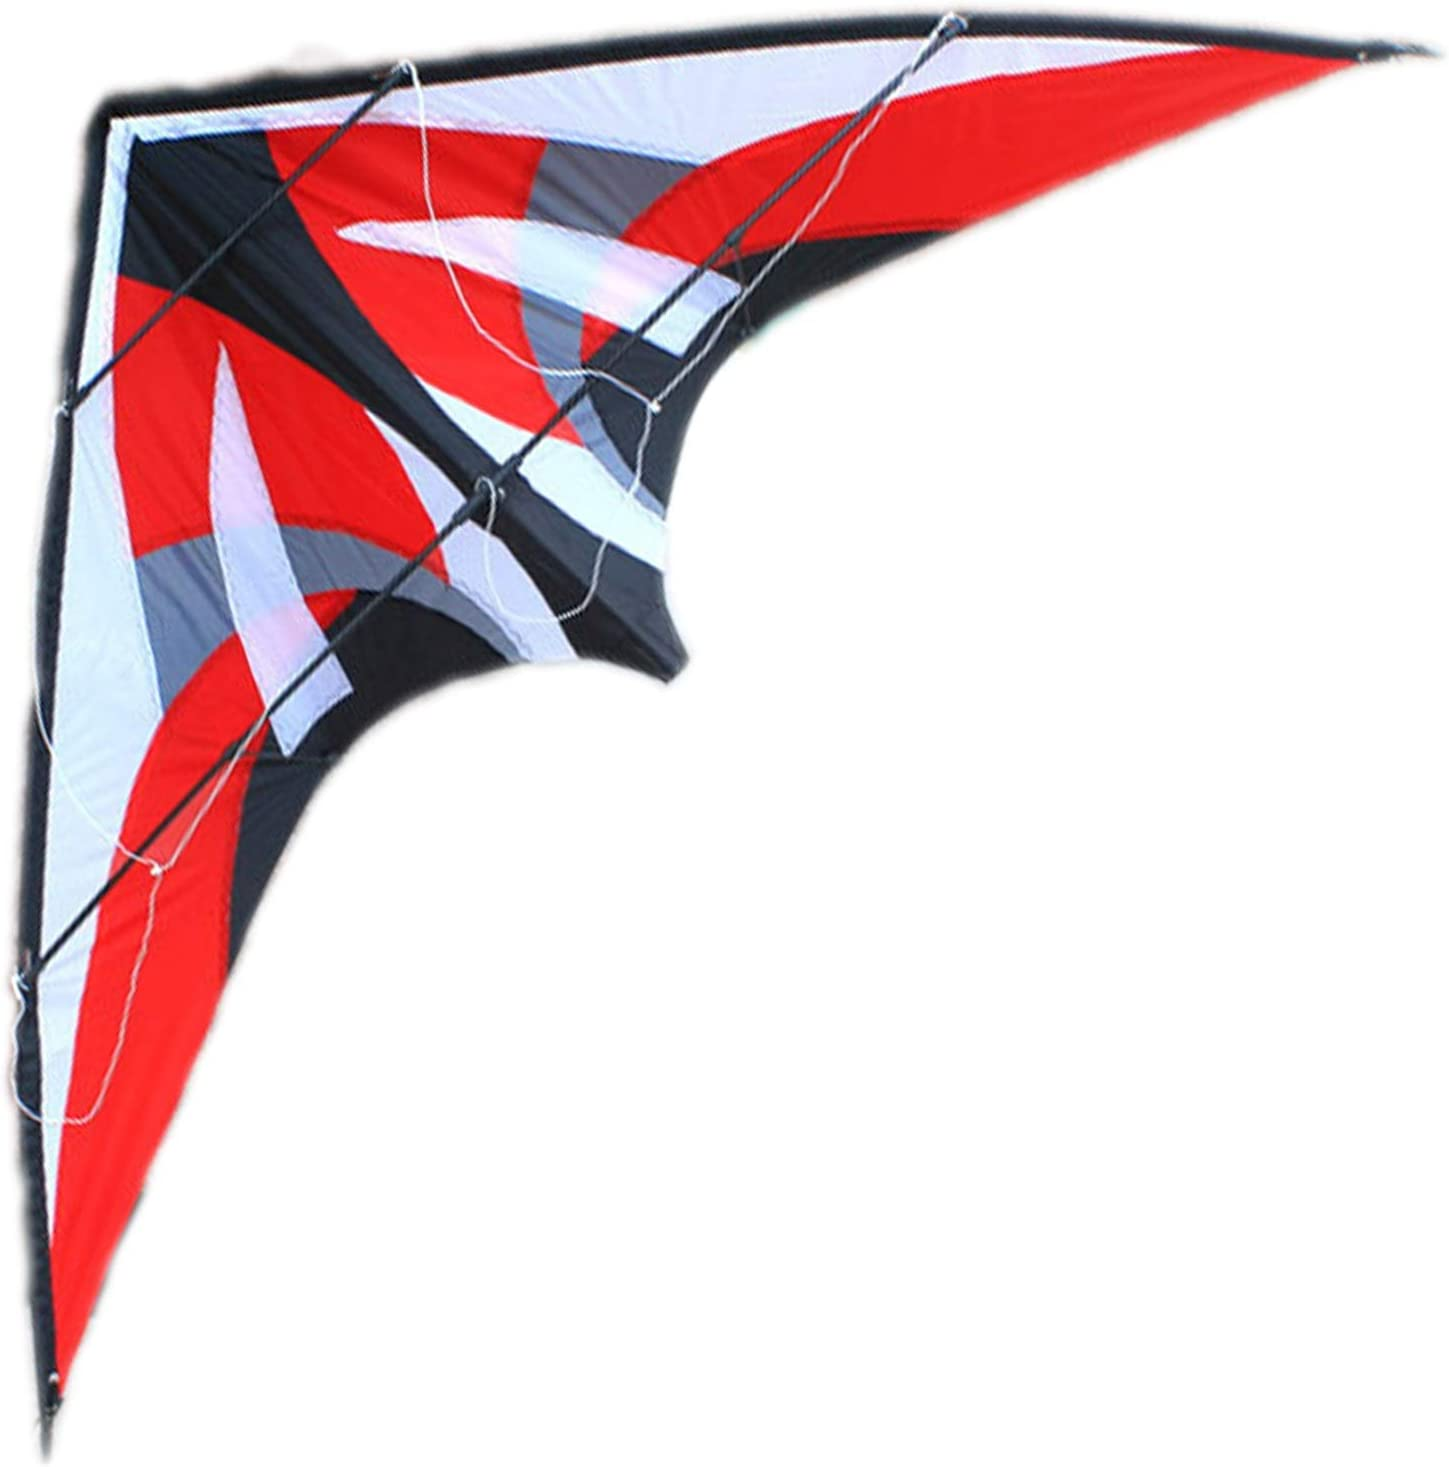 Ranking TOP14 XIBEI Stunt Kite - 70 x Tulsa Mall 29 and Vibrant Dual Line inch Viv